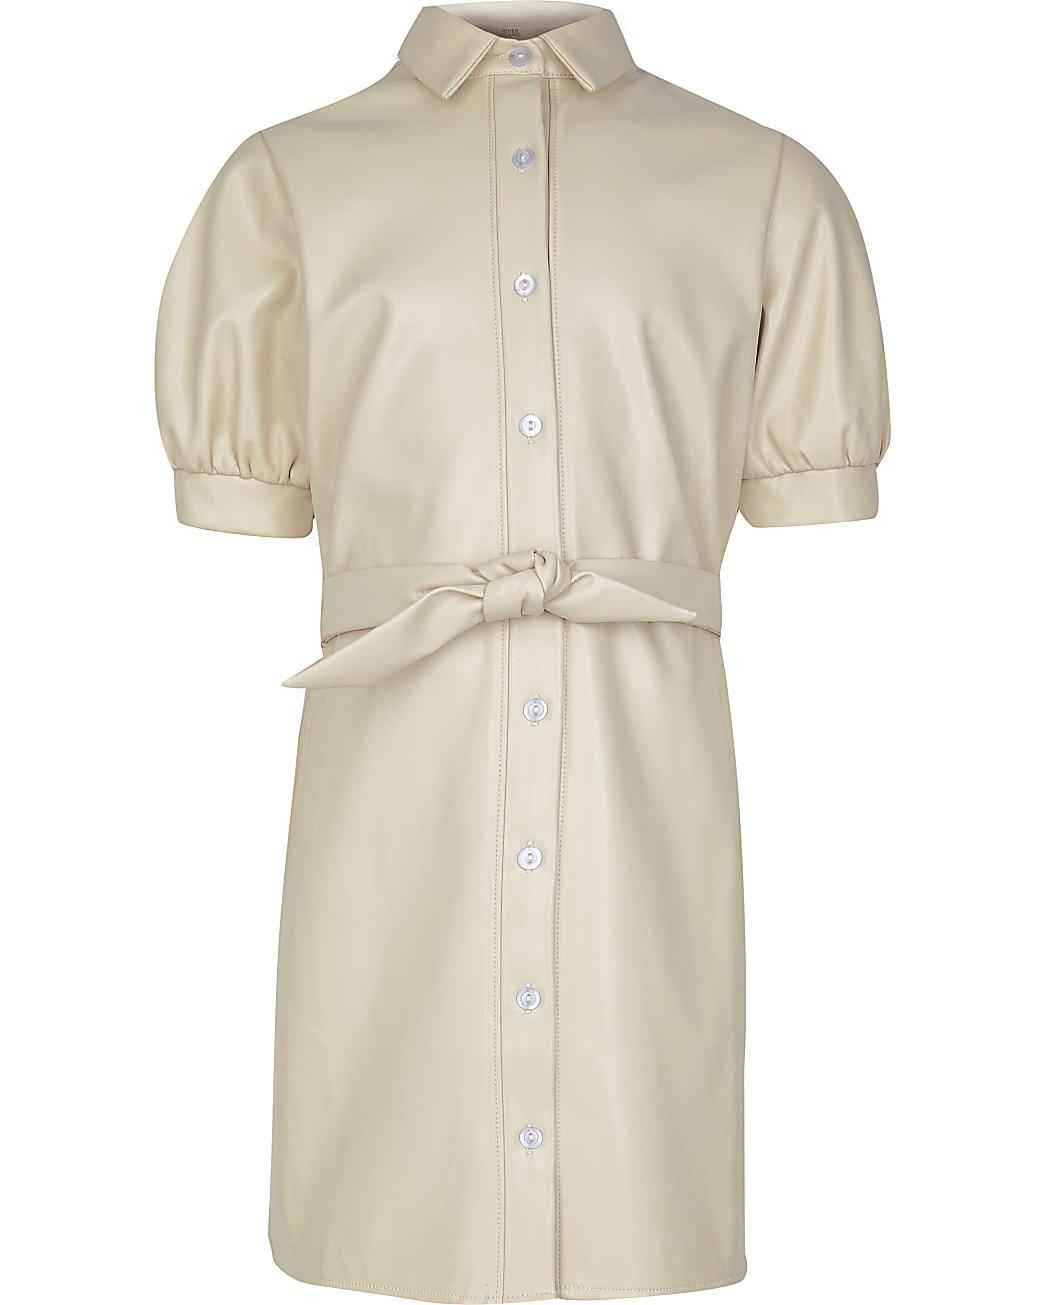 Girls cream faux leather shirt dress